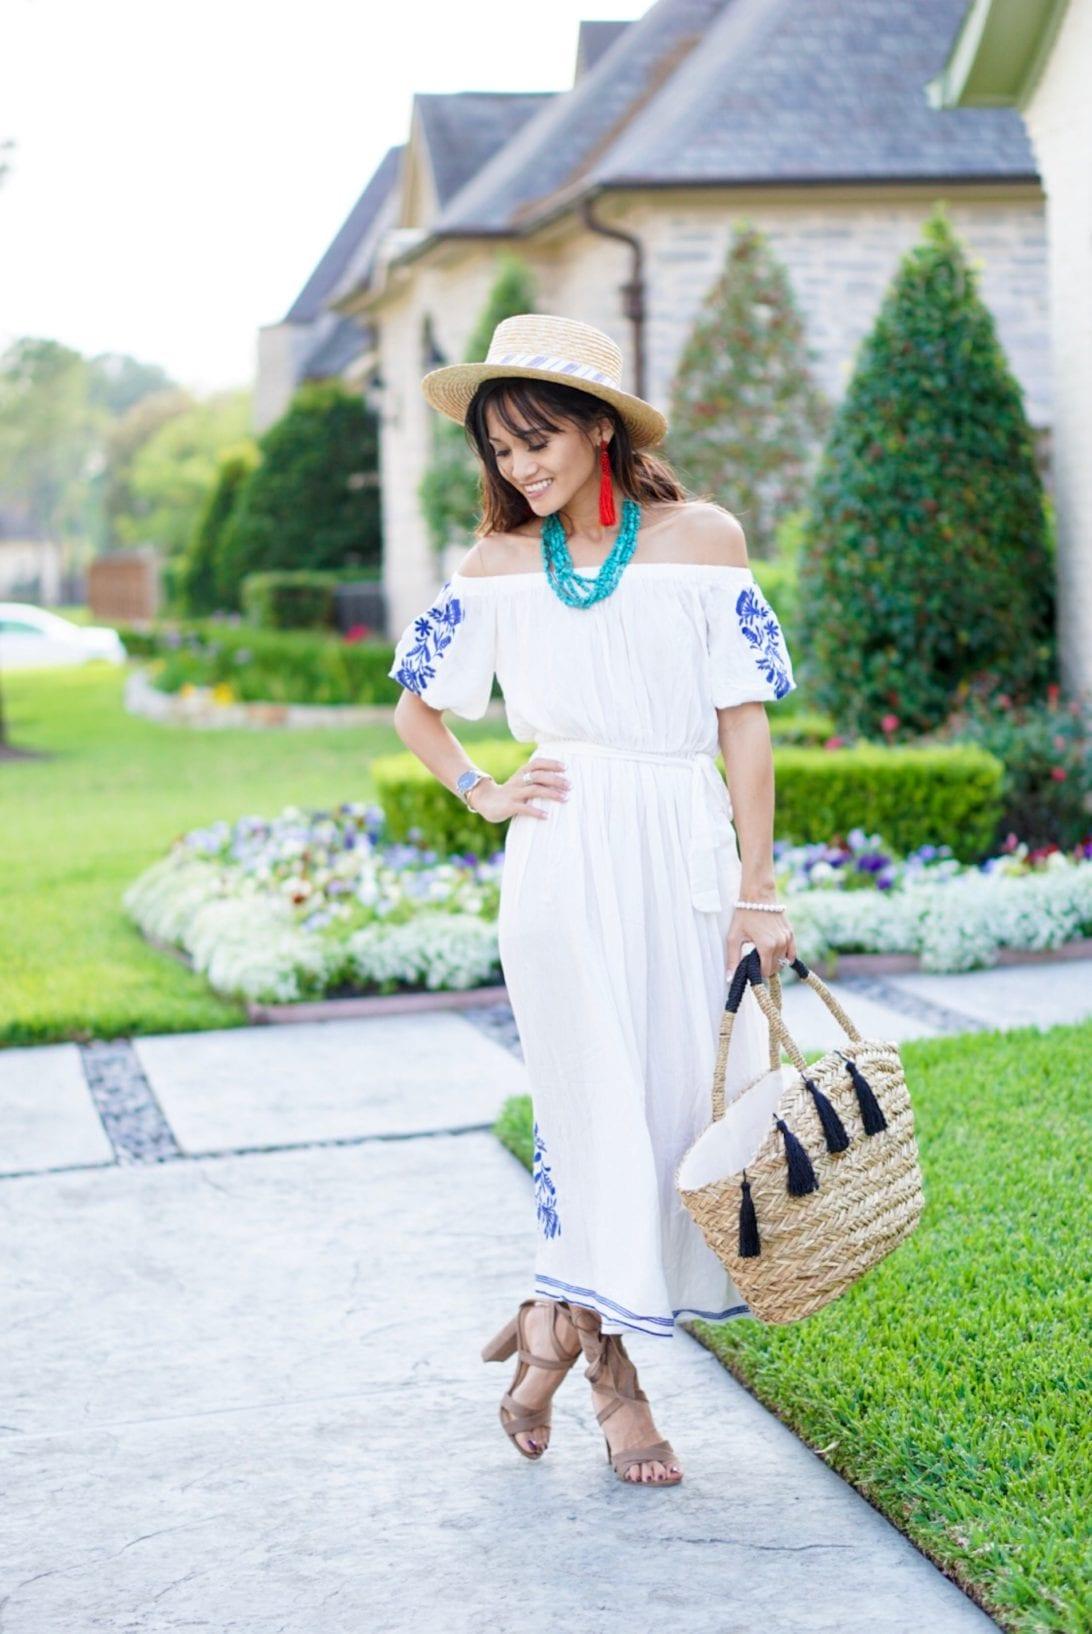 embroidered white dress, red tassel earrings, boater hat, tassel beach bag, summer outfit